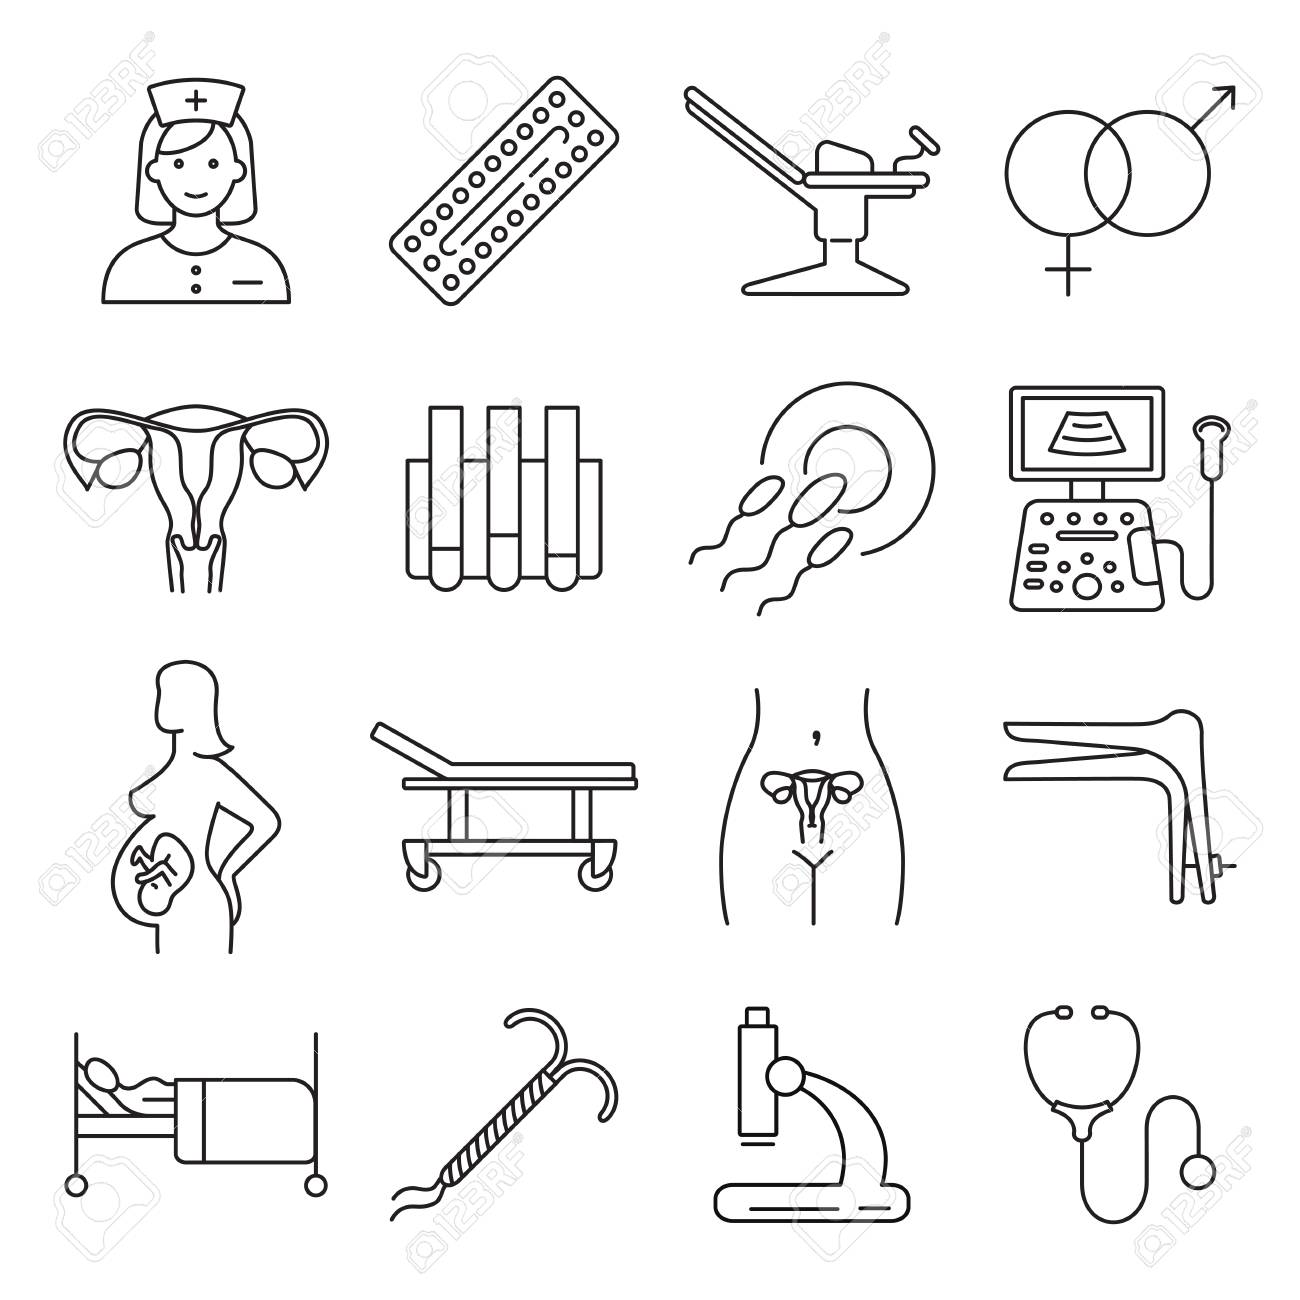 Vector gynecology symbols icon set. - 79793826